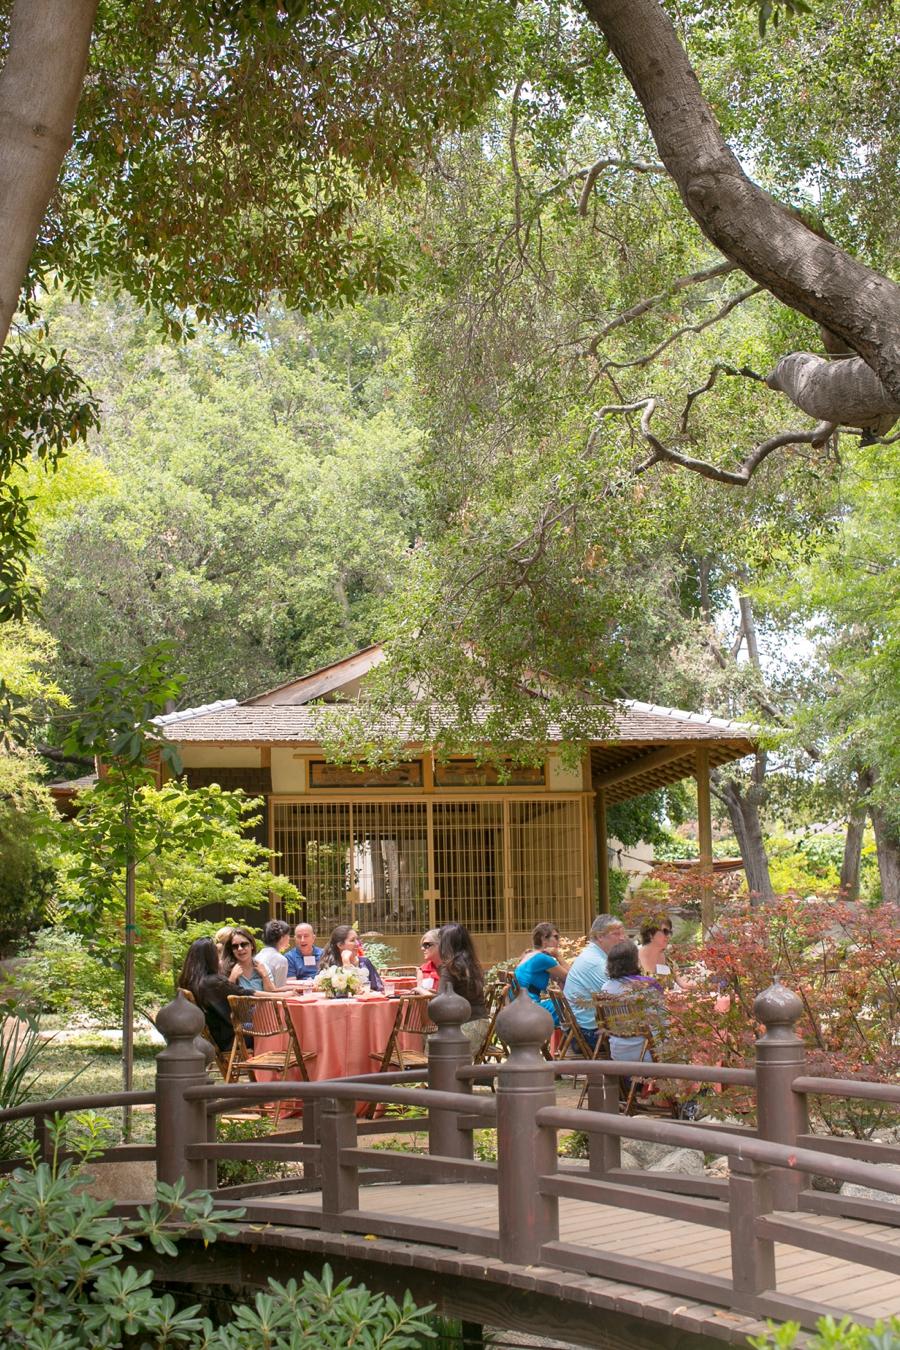 Storrier-Stearns Japanese Garden PASADENA WEDDING PHOTOGRAPHER CHRIS HOLT PHOTOGRAPHY_026.jpg